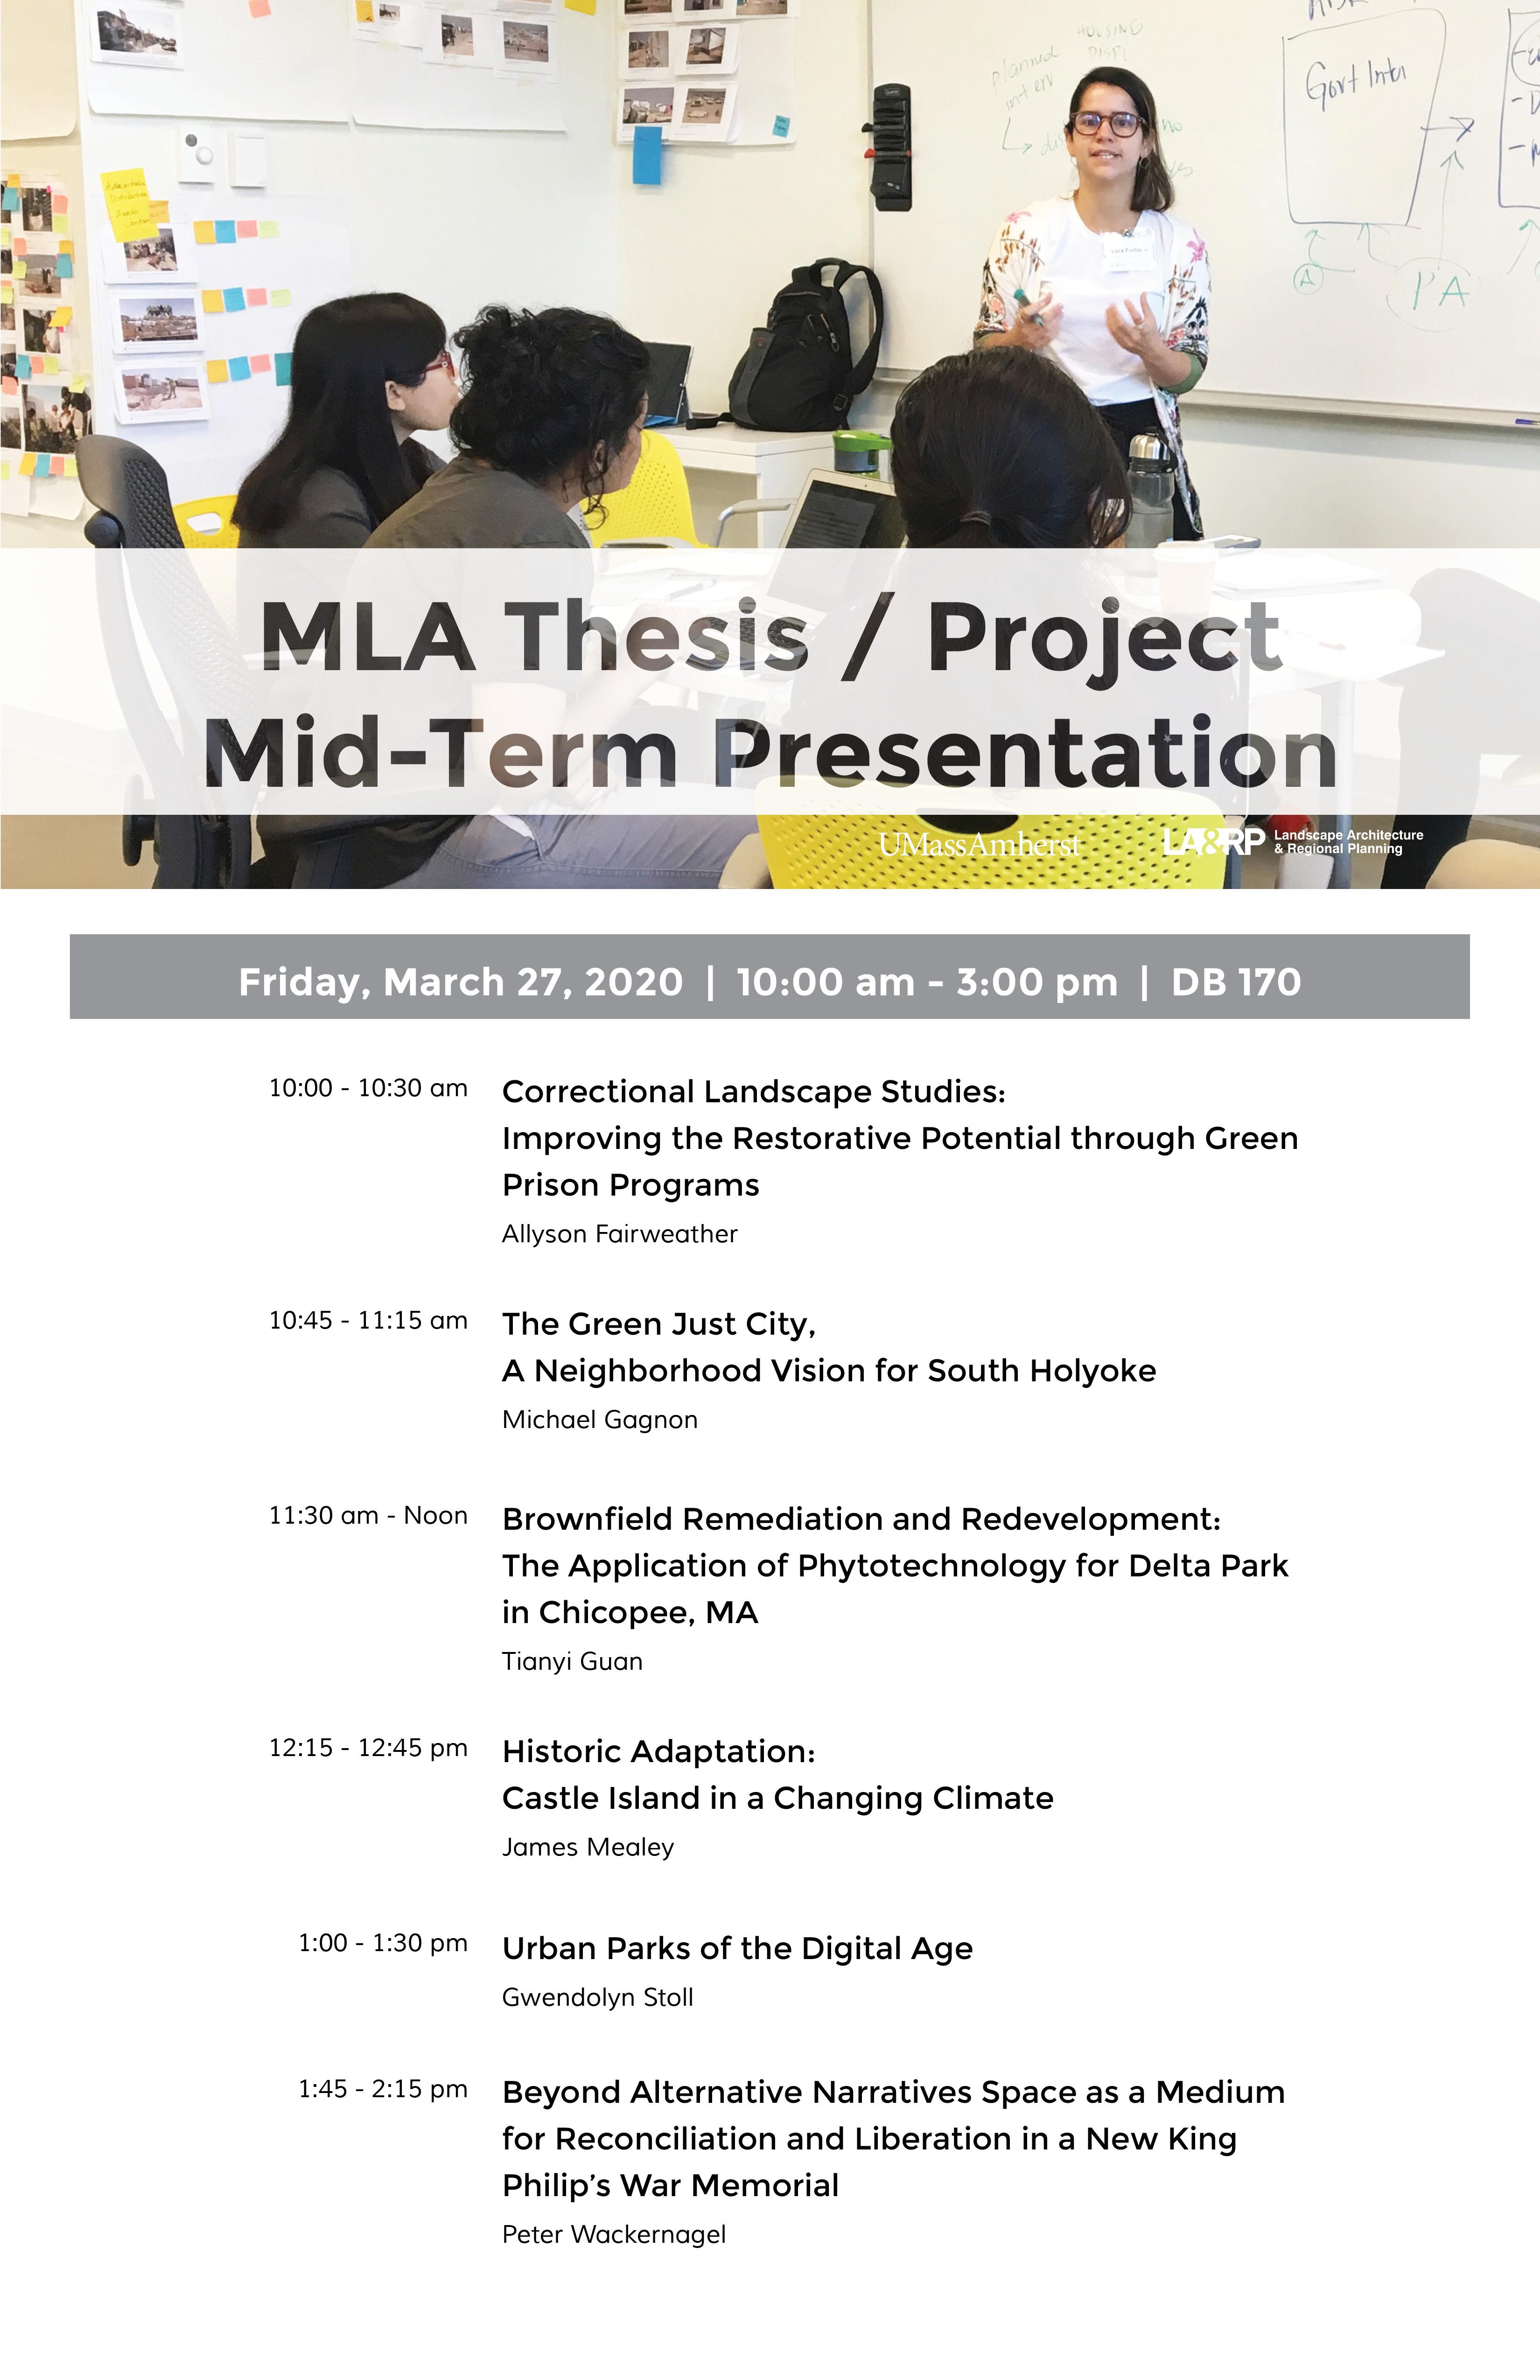 MLA thesis project presentation 3_27_20